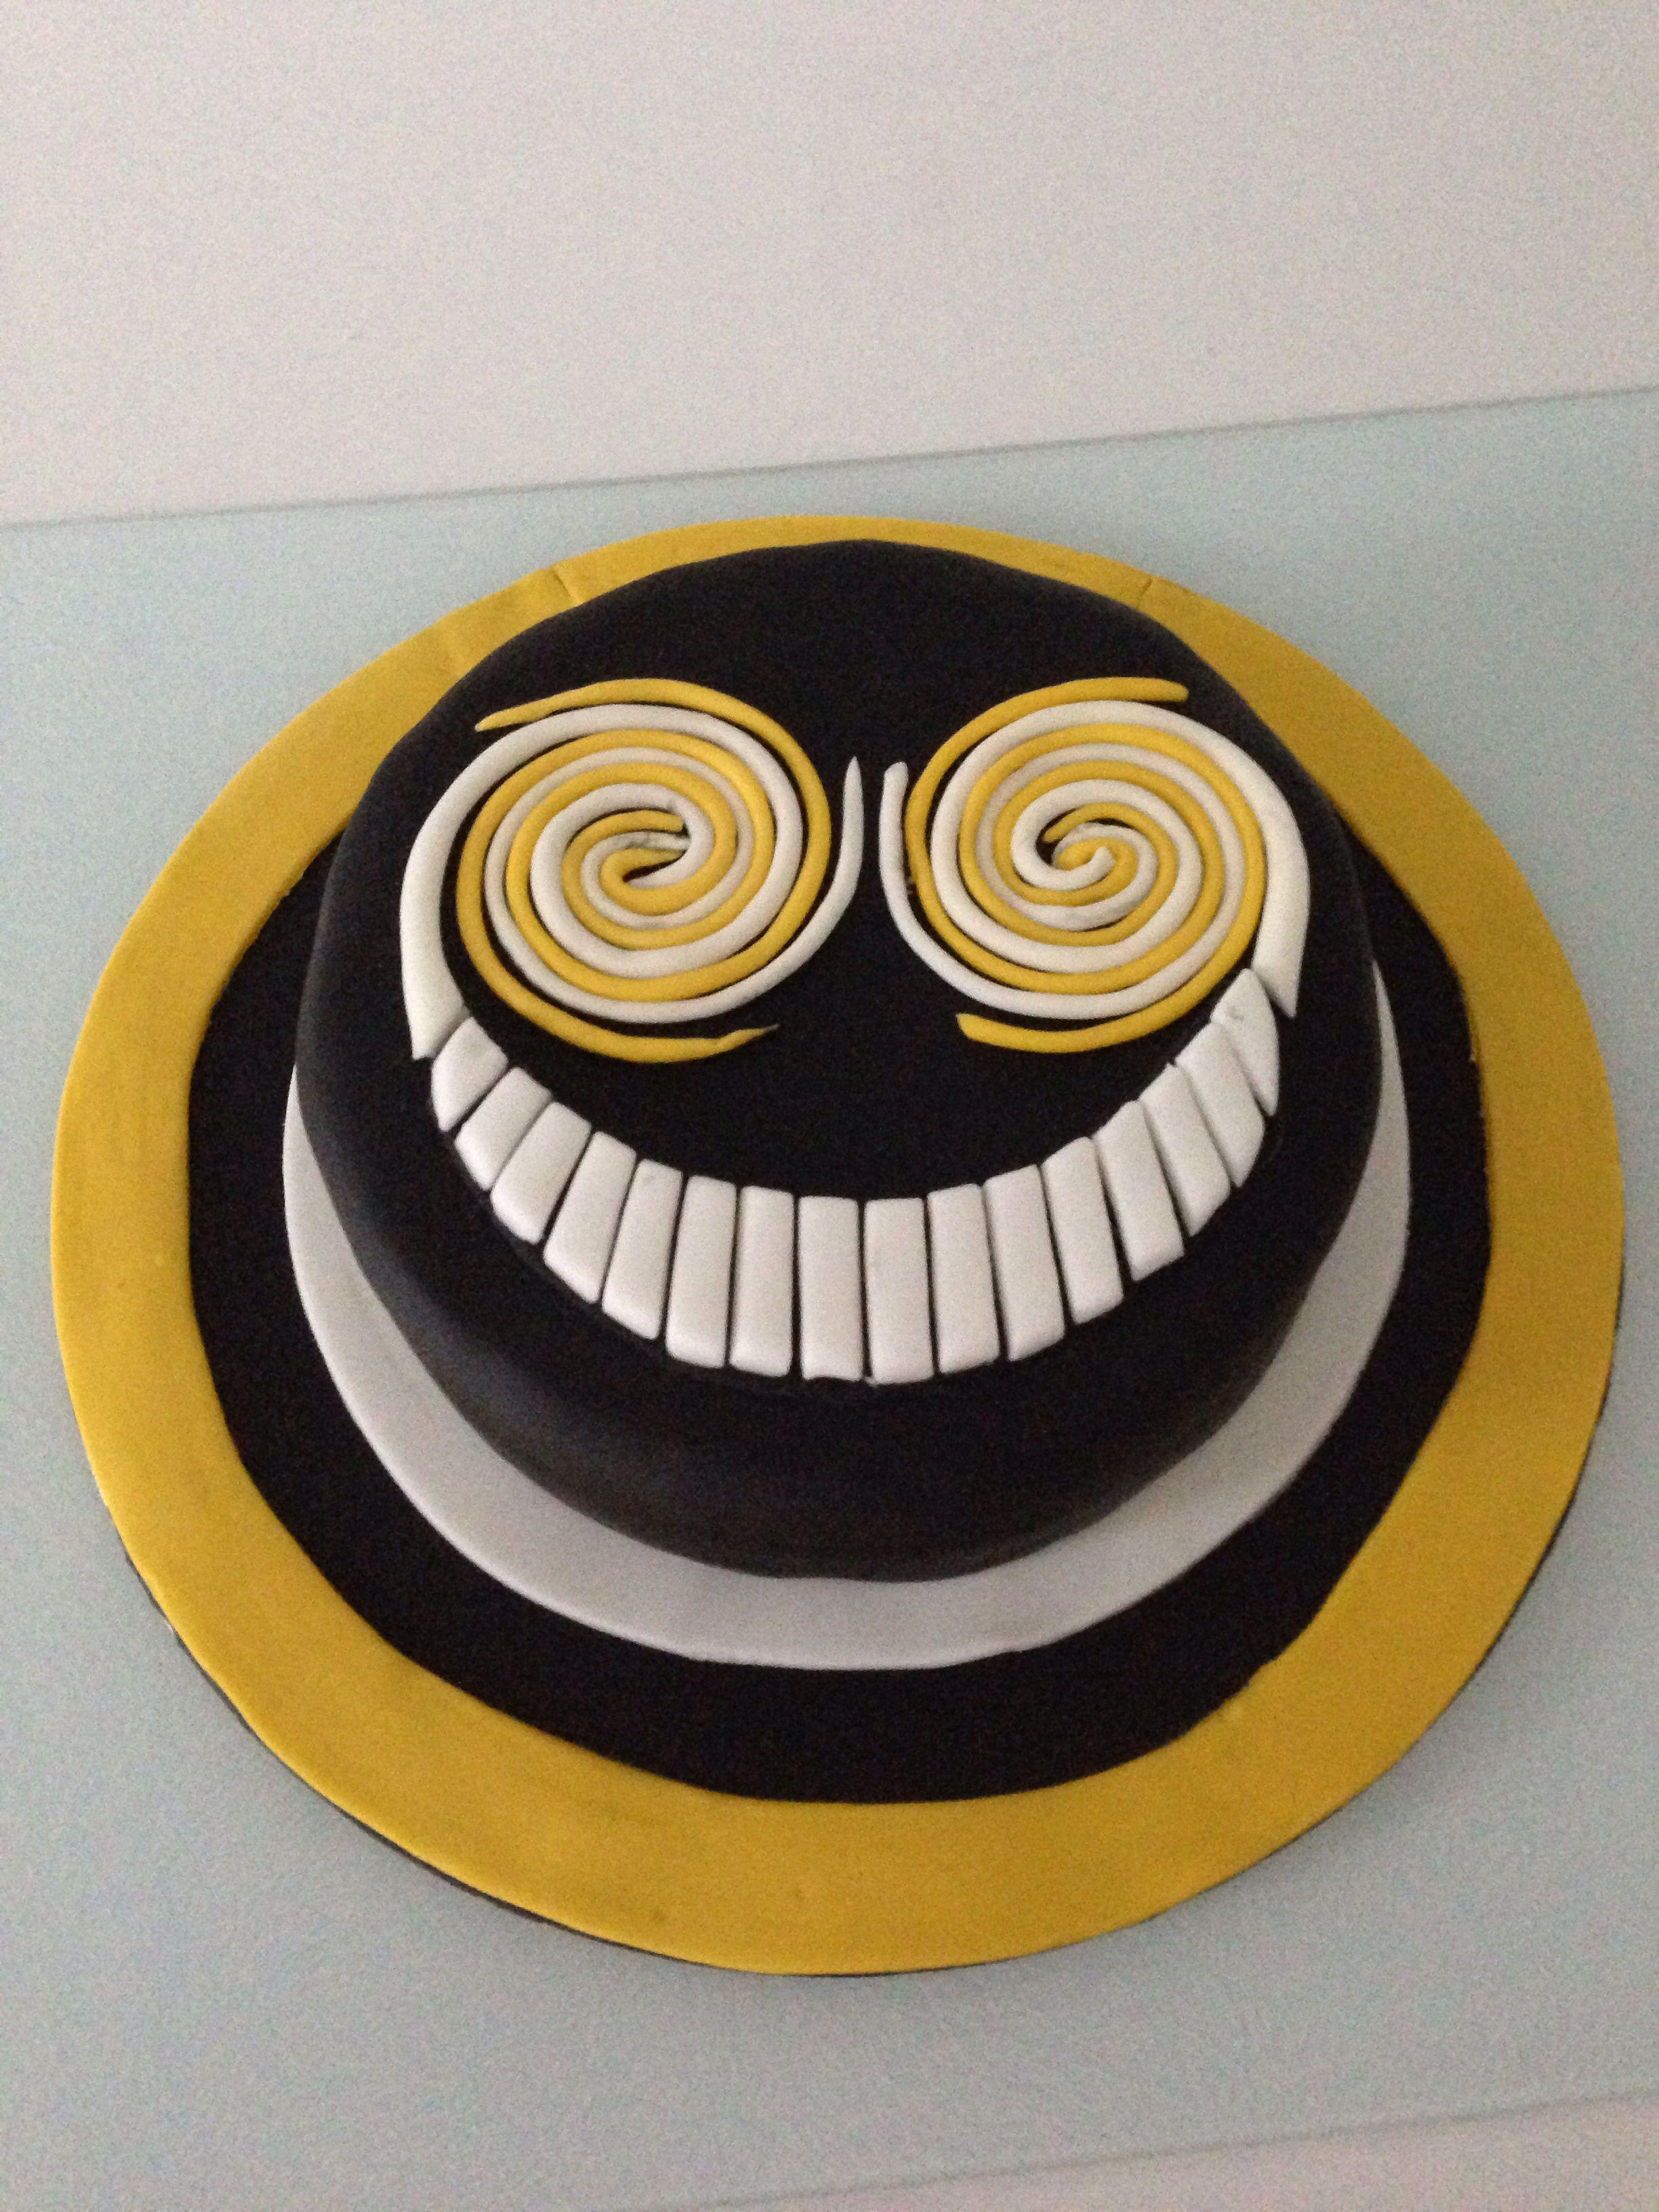 The Smiler Birthday Cake Roller Coaster Cake Fondant Dog No Bake Cake